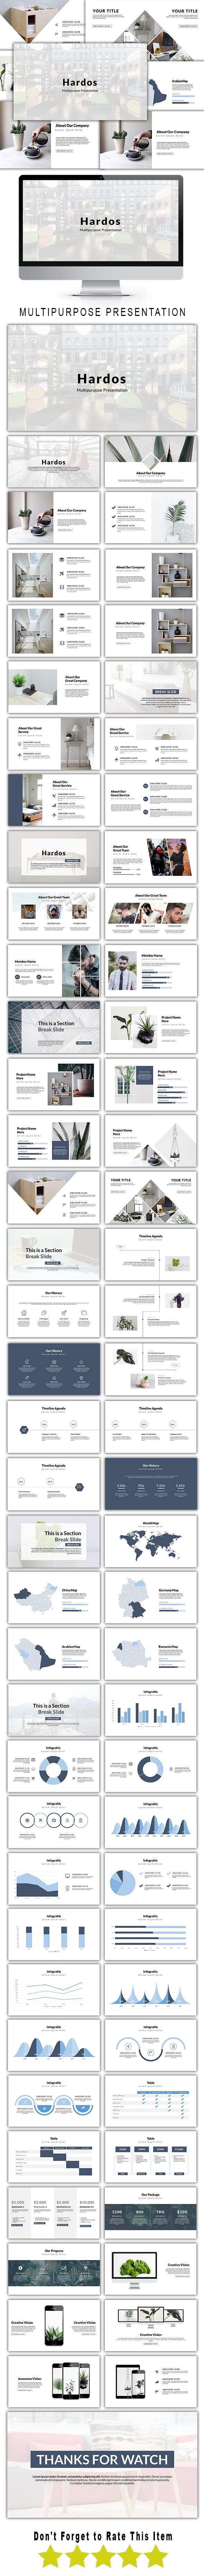 Hardos Multipurpose Powerpoint Template - PowerPoint Templates Presentation Templates